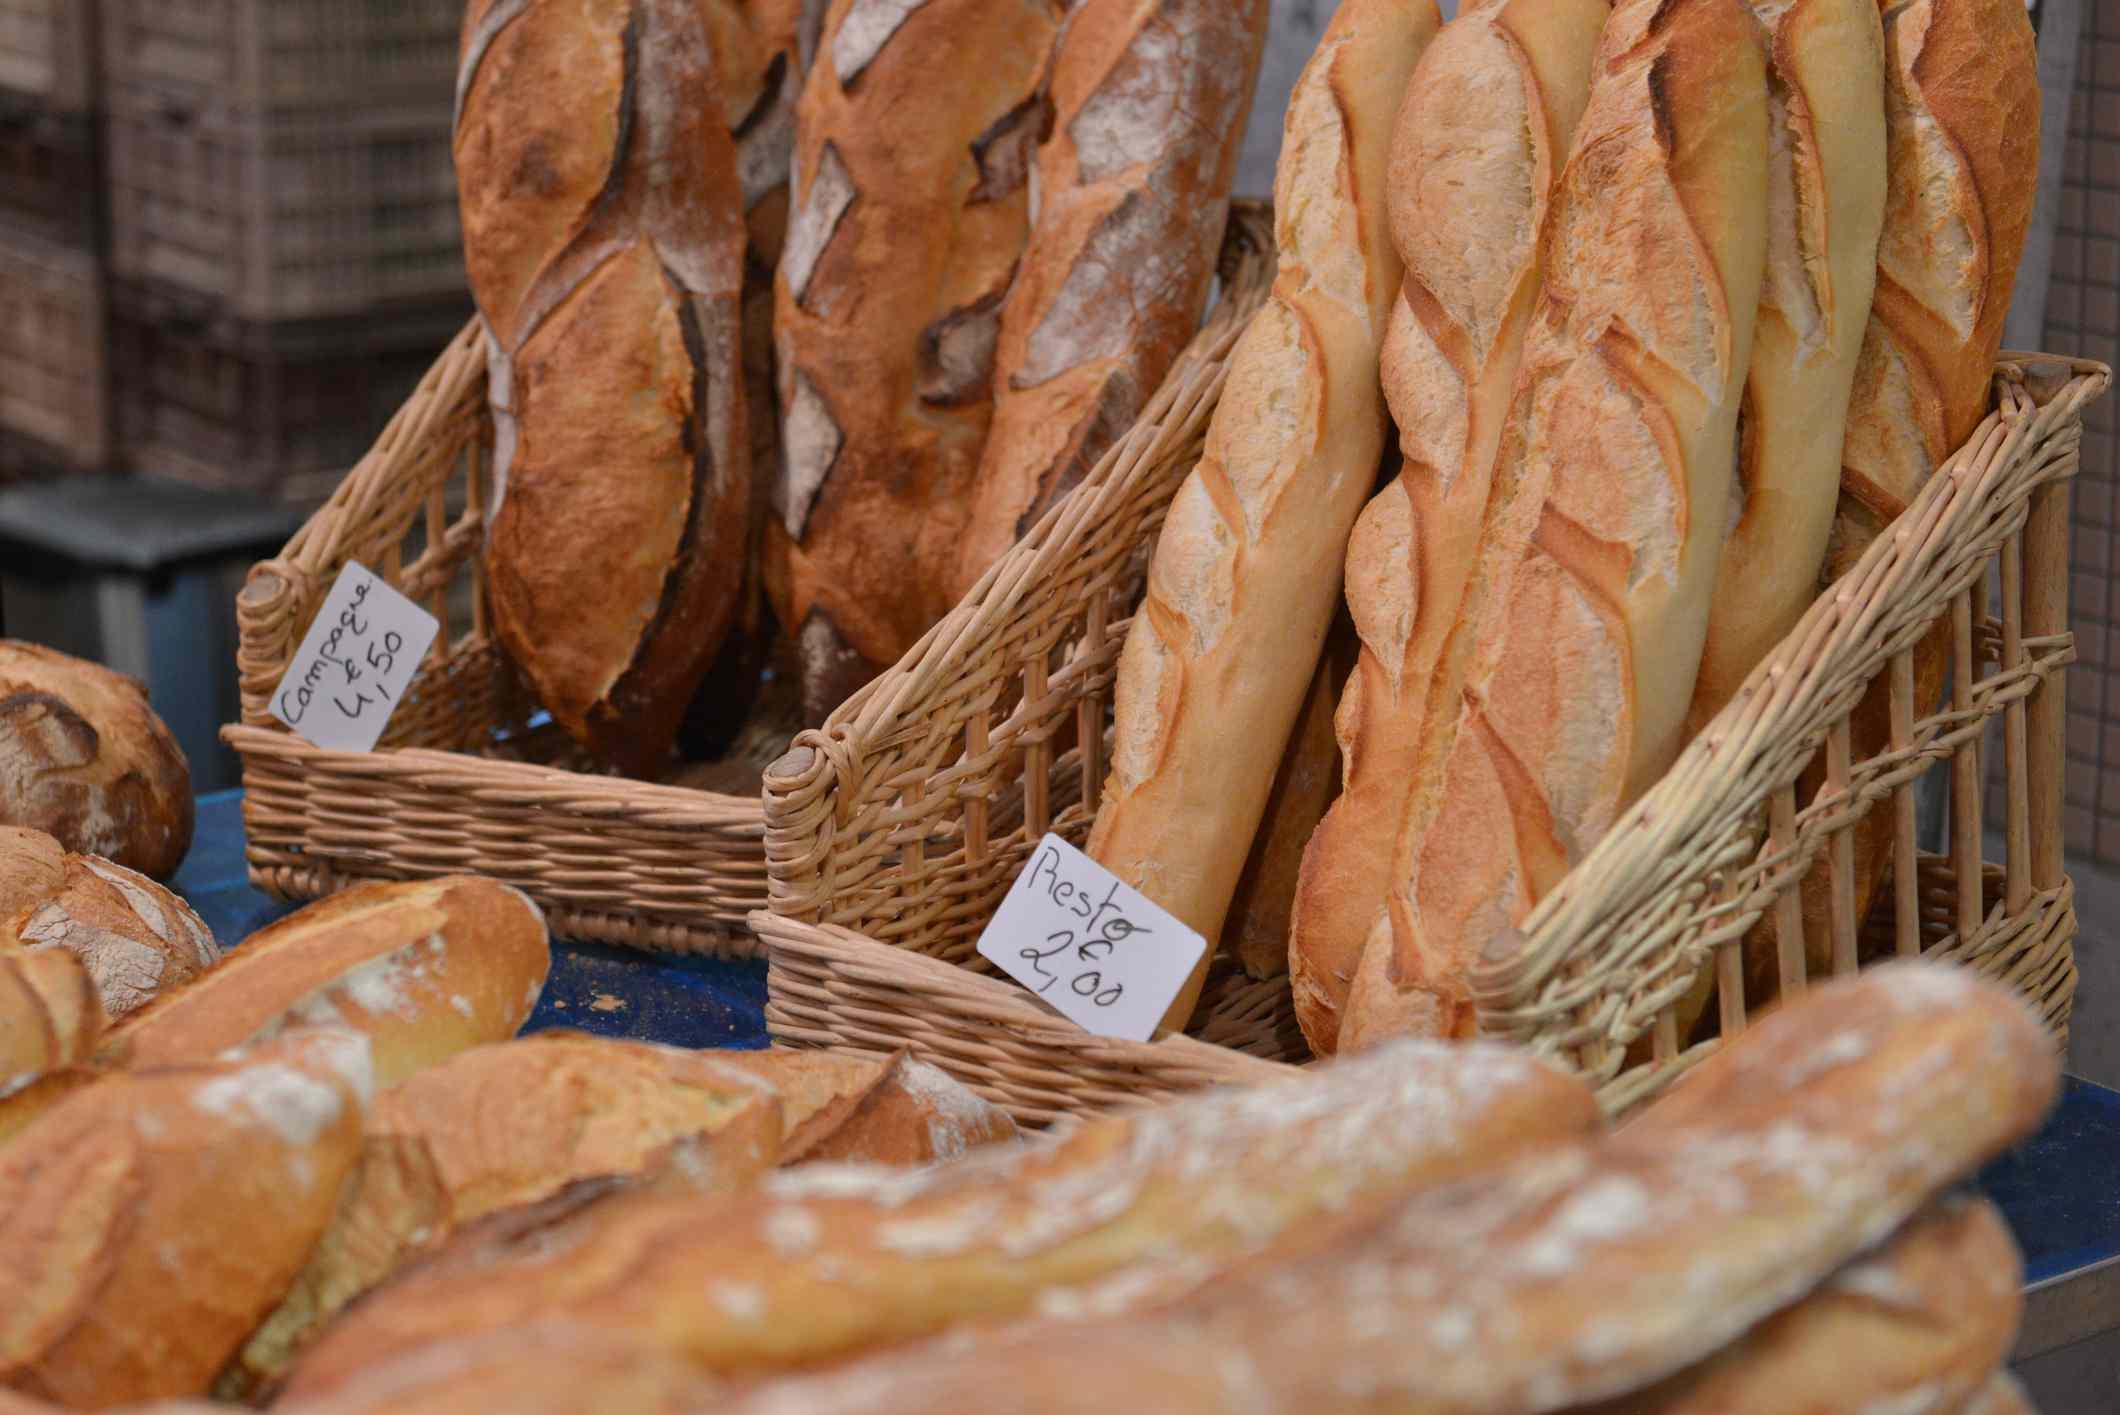 Barras de pan y baguettes a la venta, Francia